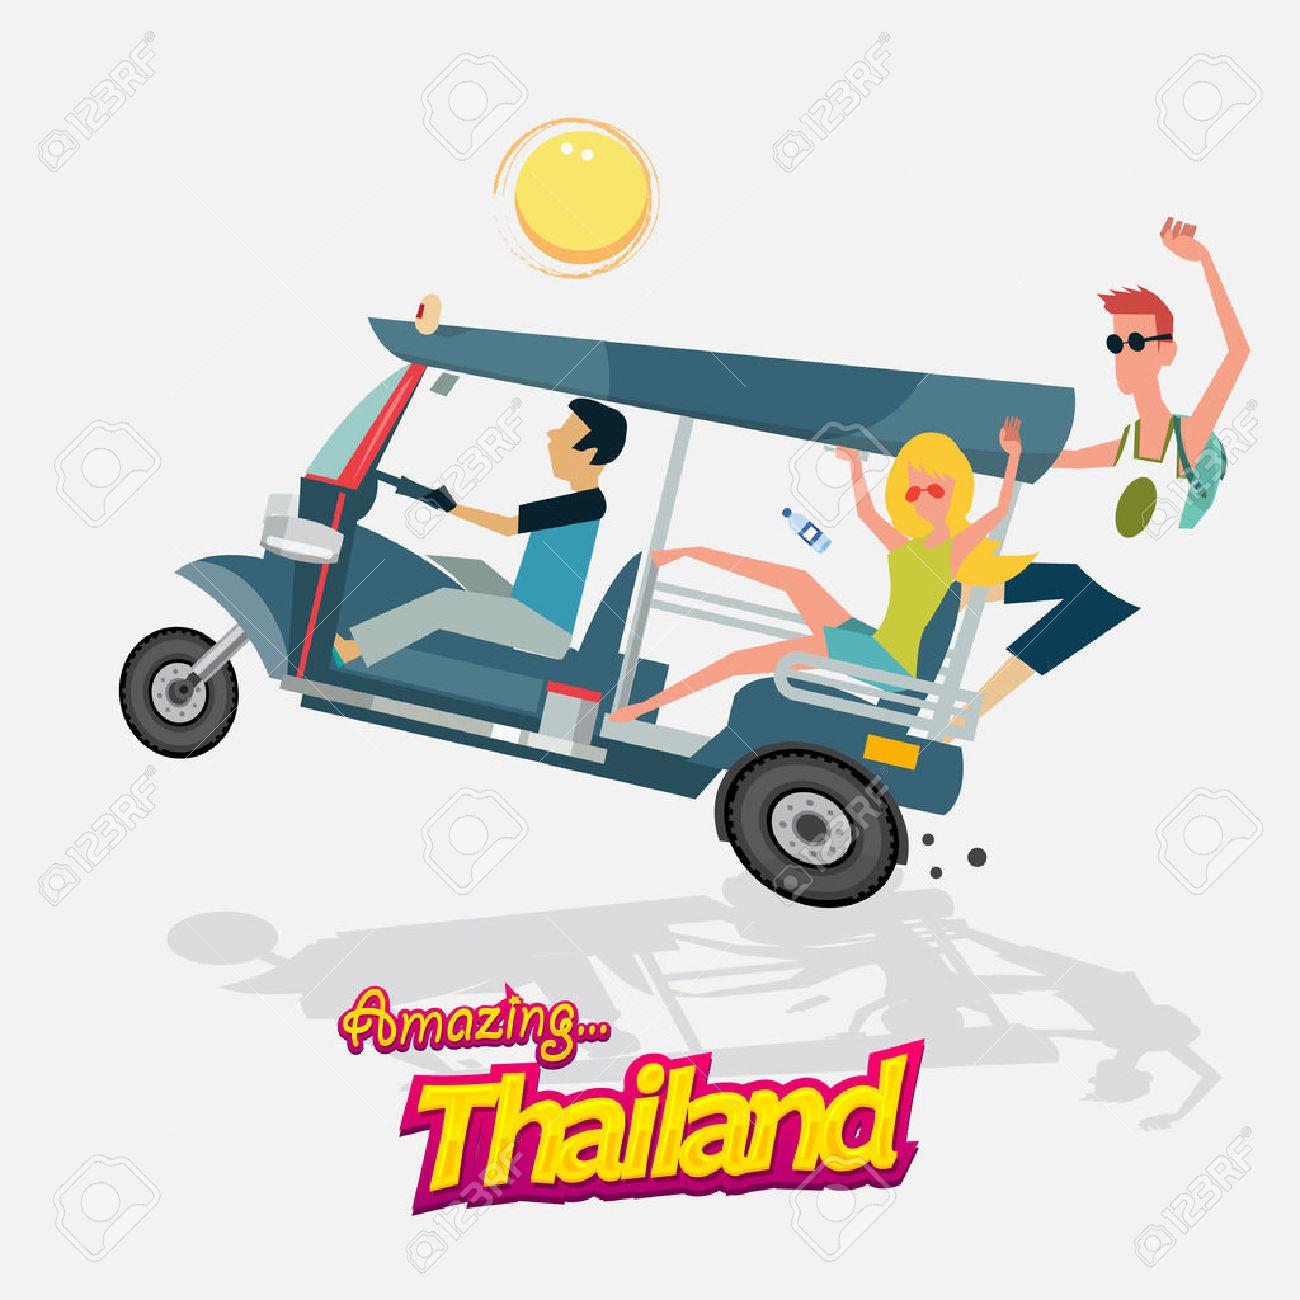 286 Tuktuk Stock Illustrations, Cliparts And Royalty Free Tuktuk.